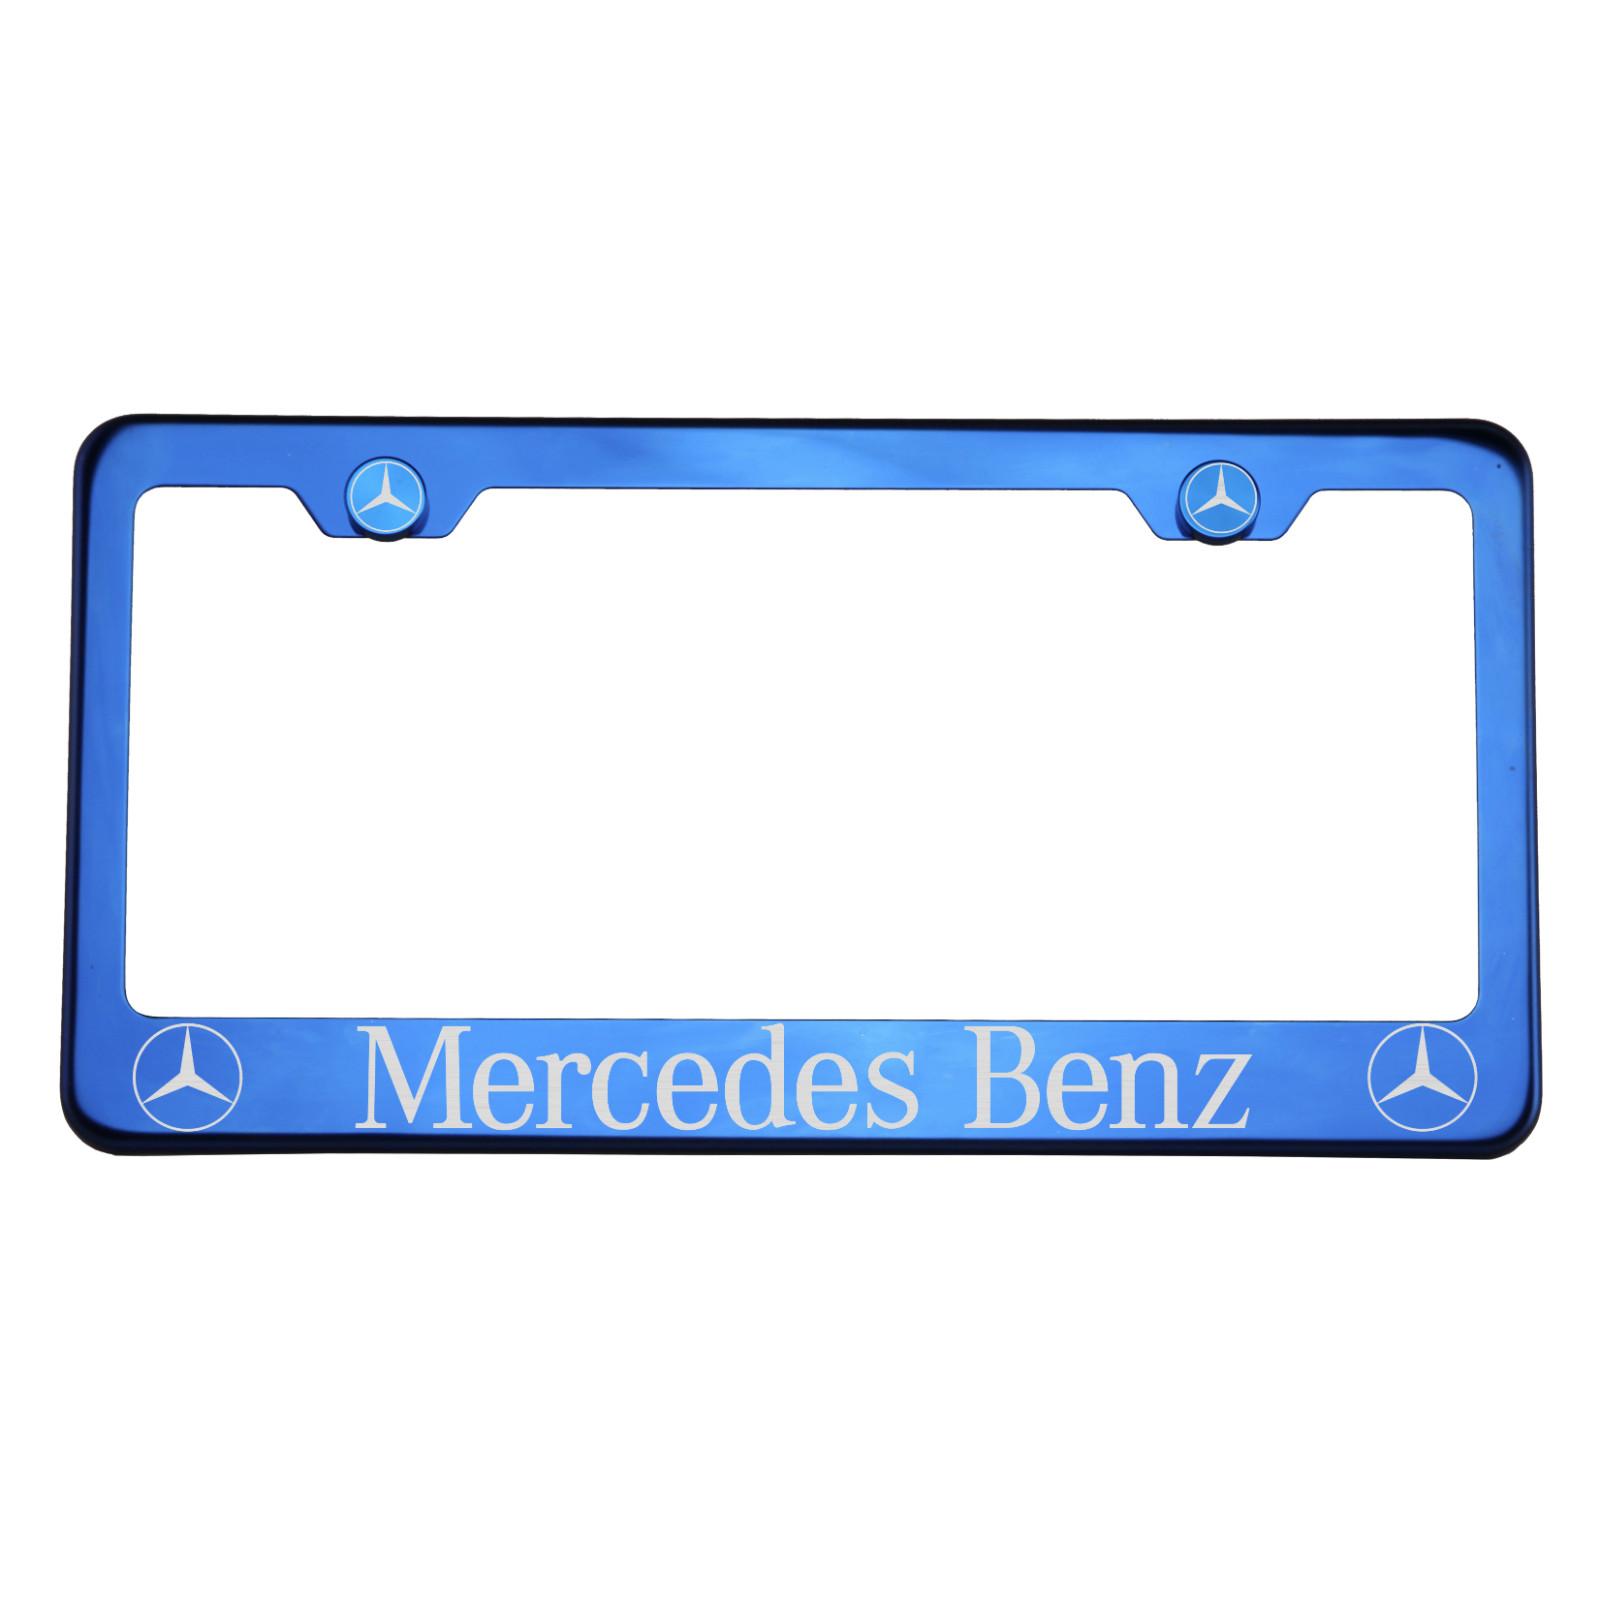 T304 Azul Cromo Placa Marco De Acero Inoxidable Mercedes Benz Láser ...